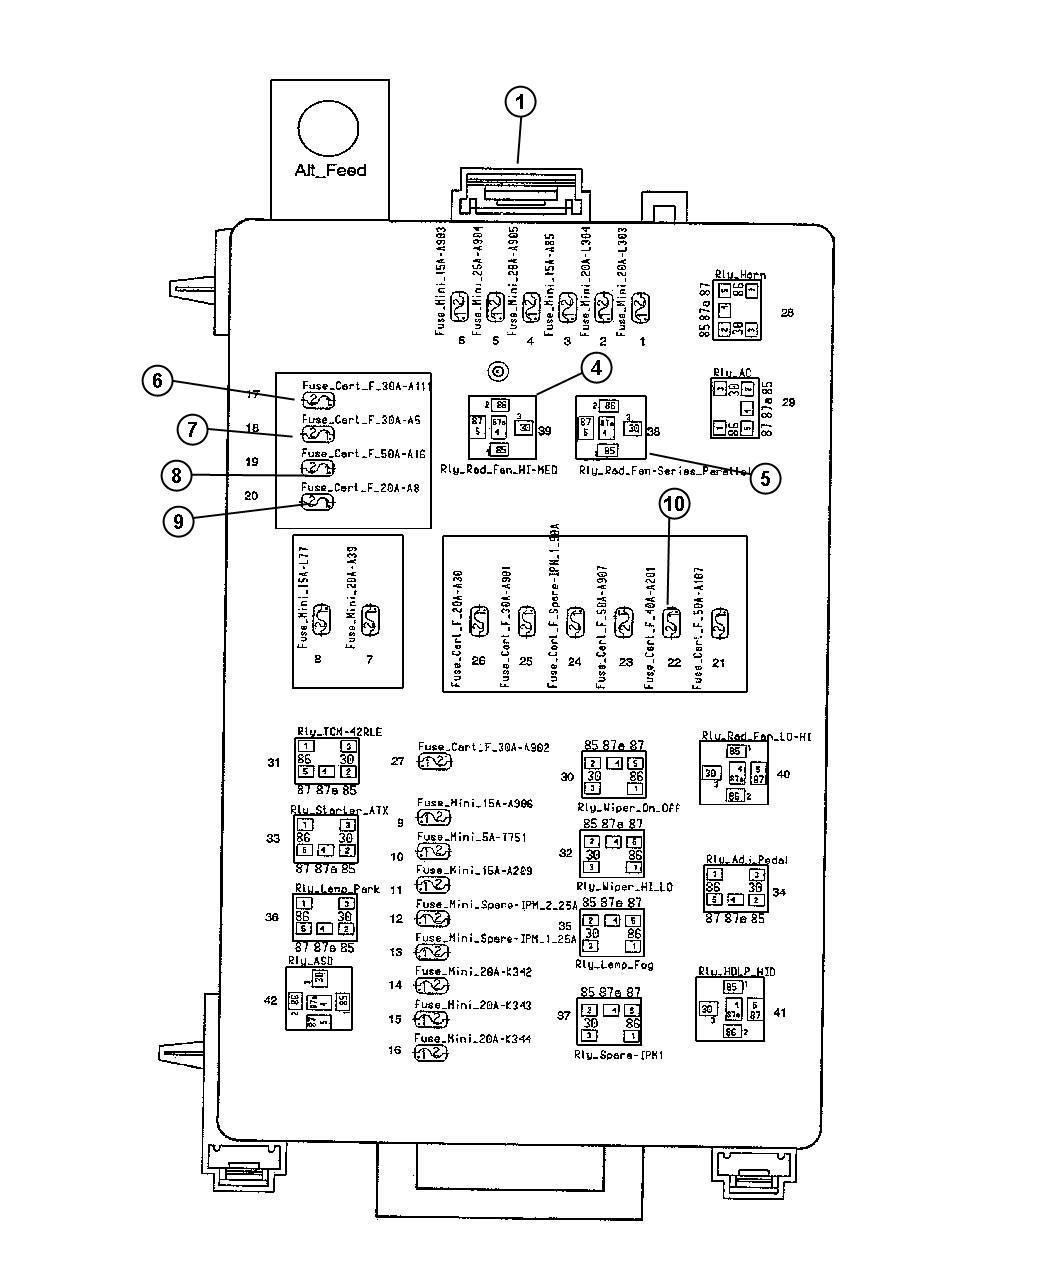 2016 Dodge Challenger Fuse. J case. 30 amp. Adaptive